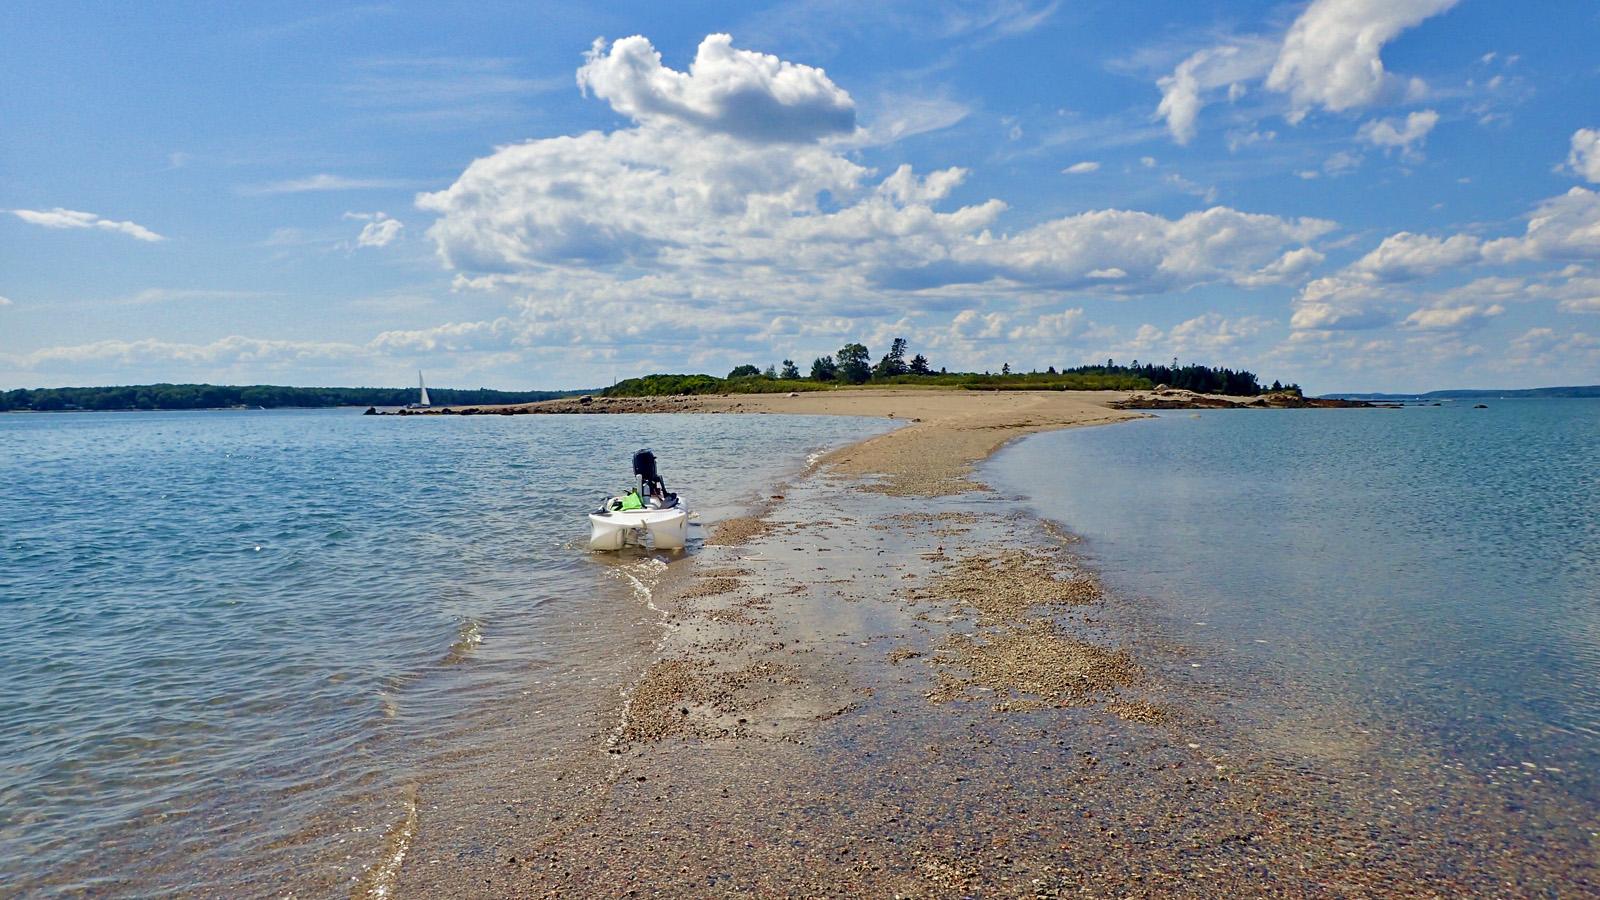 Wavewalk S4 on Torrey Island sandbar, Maine